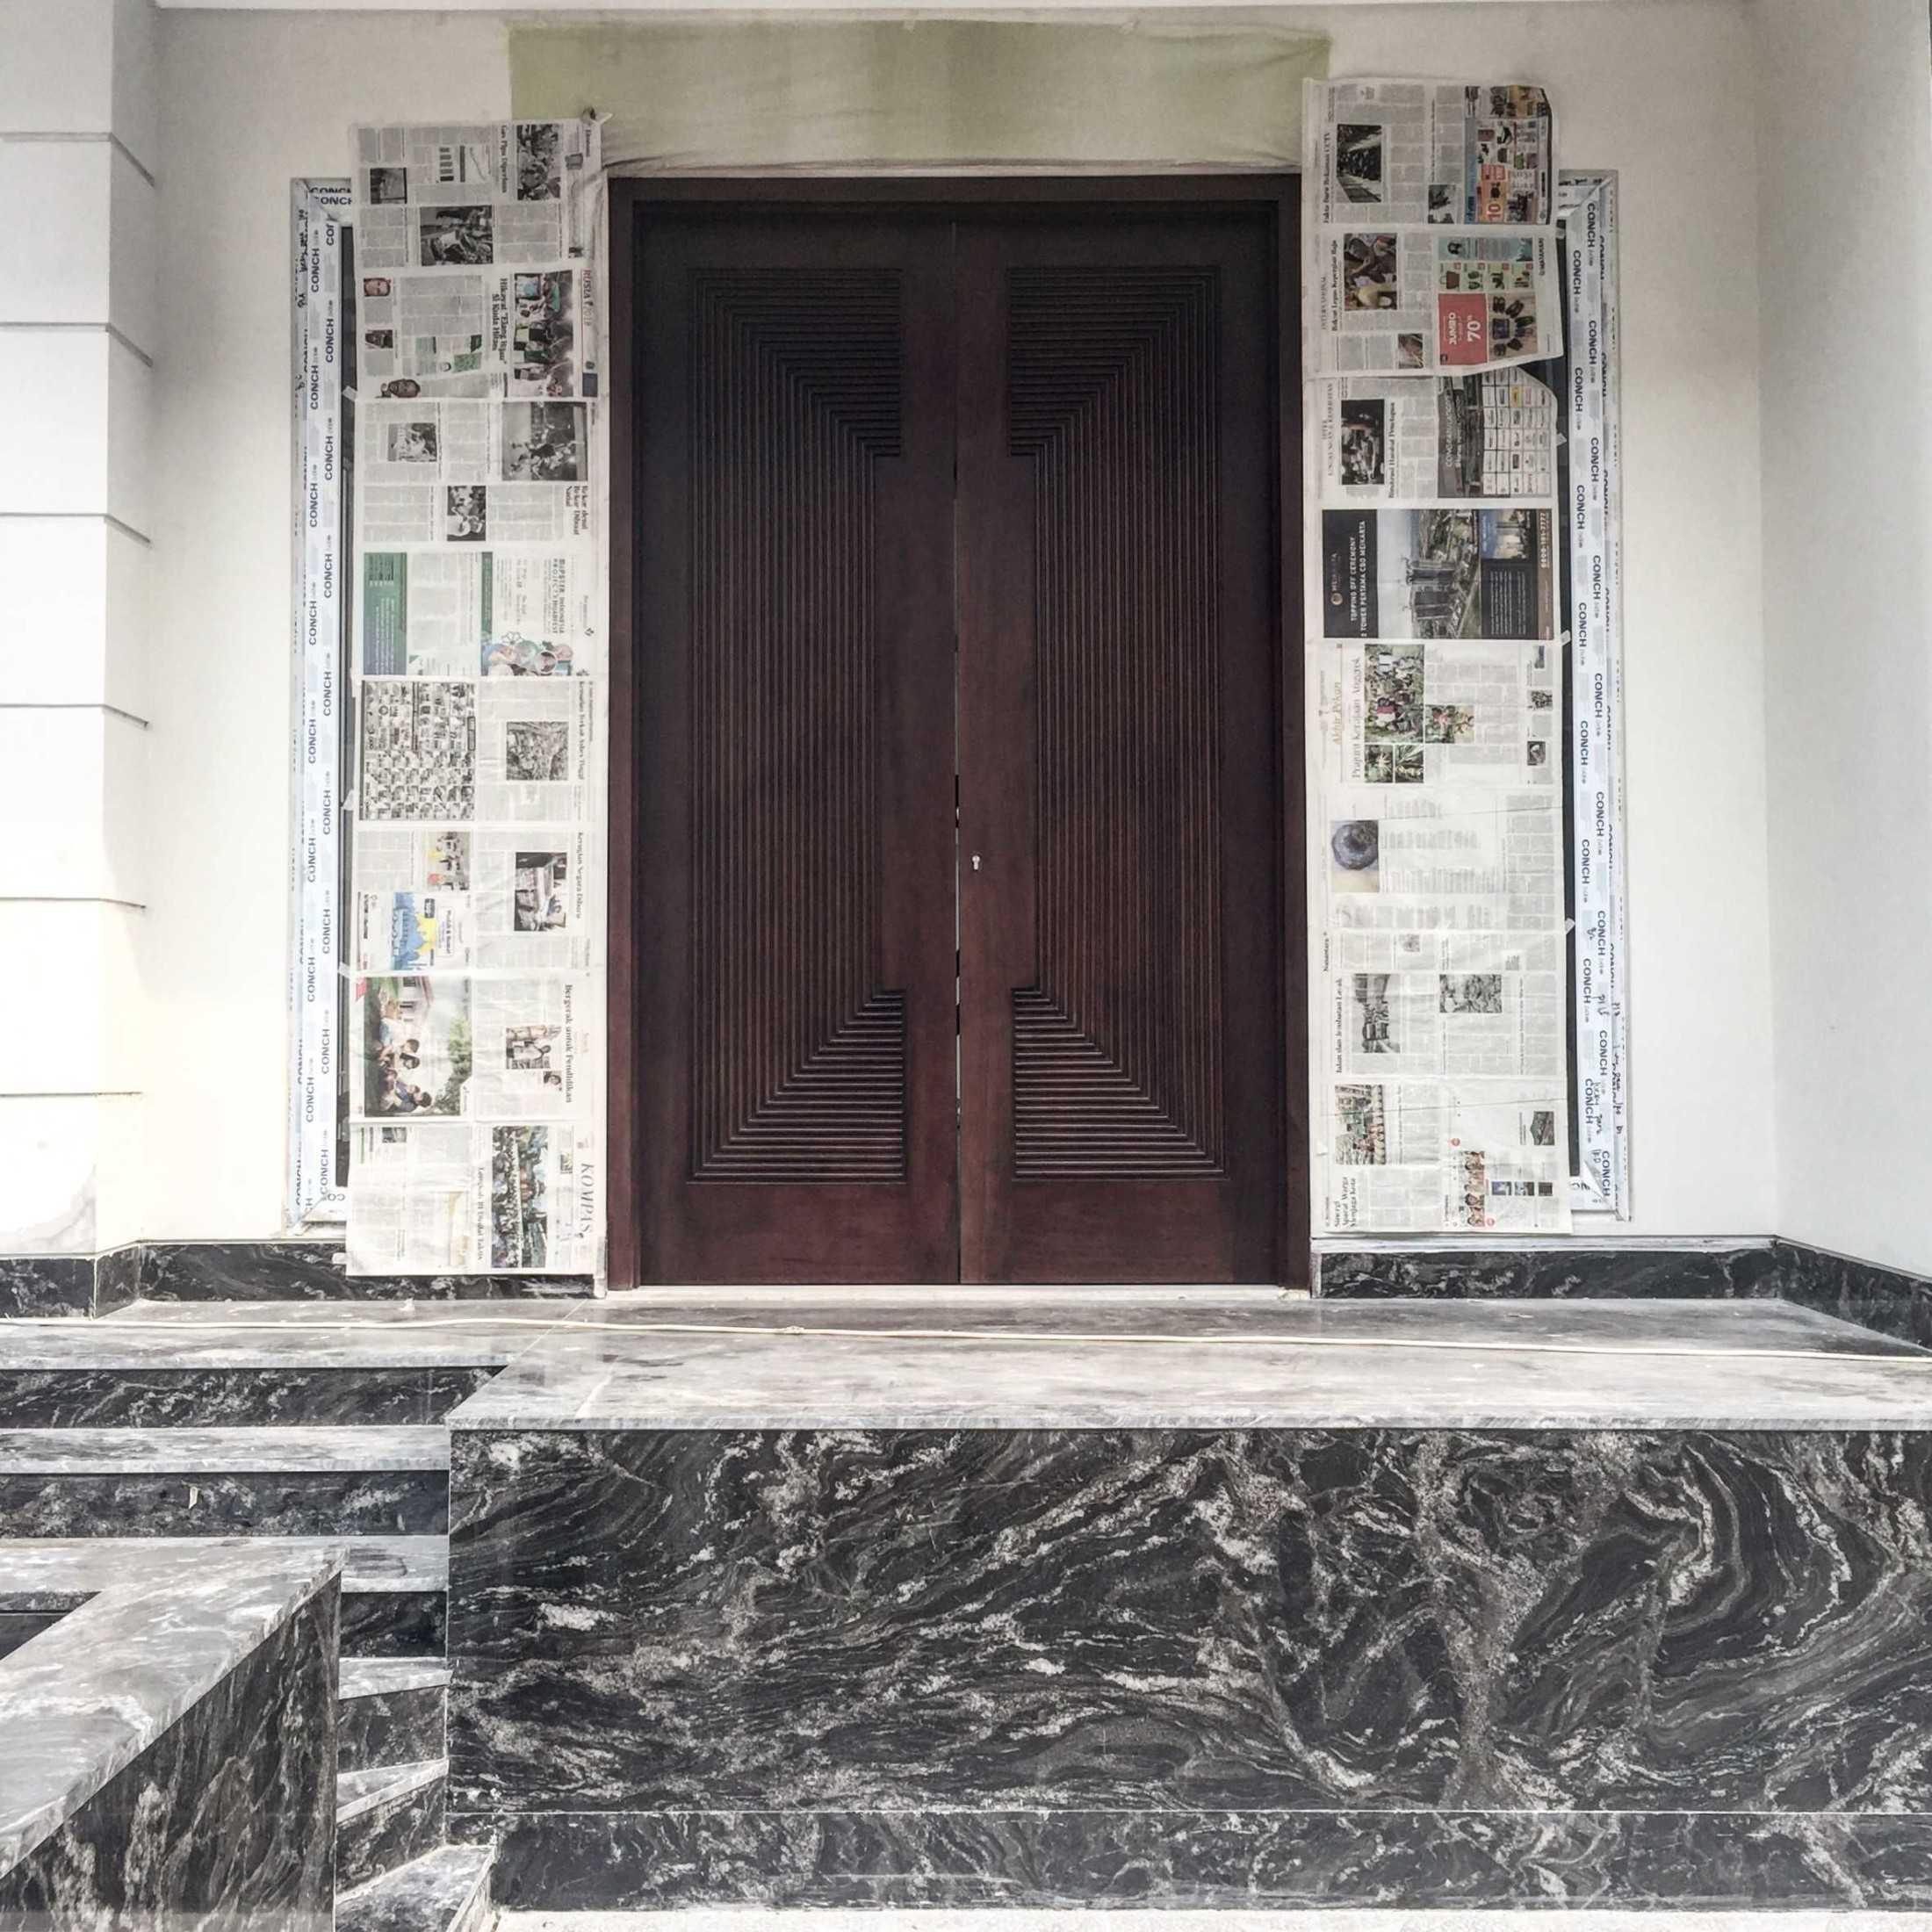 Einhaus Luckypark Residence Unnamed Road, Rt.7/rw.3, Kapuk Muara, Penjaringan, North Jakarta City, Jakarta 14460, Indonesia Unnamed Road, Rt.7/rw.3, Kapuk Muara, Penjaringan, North Jakarta City, Jakarta 14460, Indonesia Einhaus-Luckypark-Residence  105794